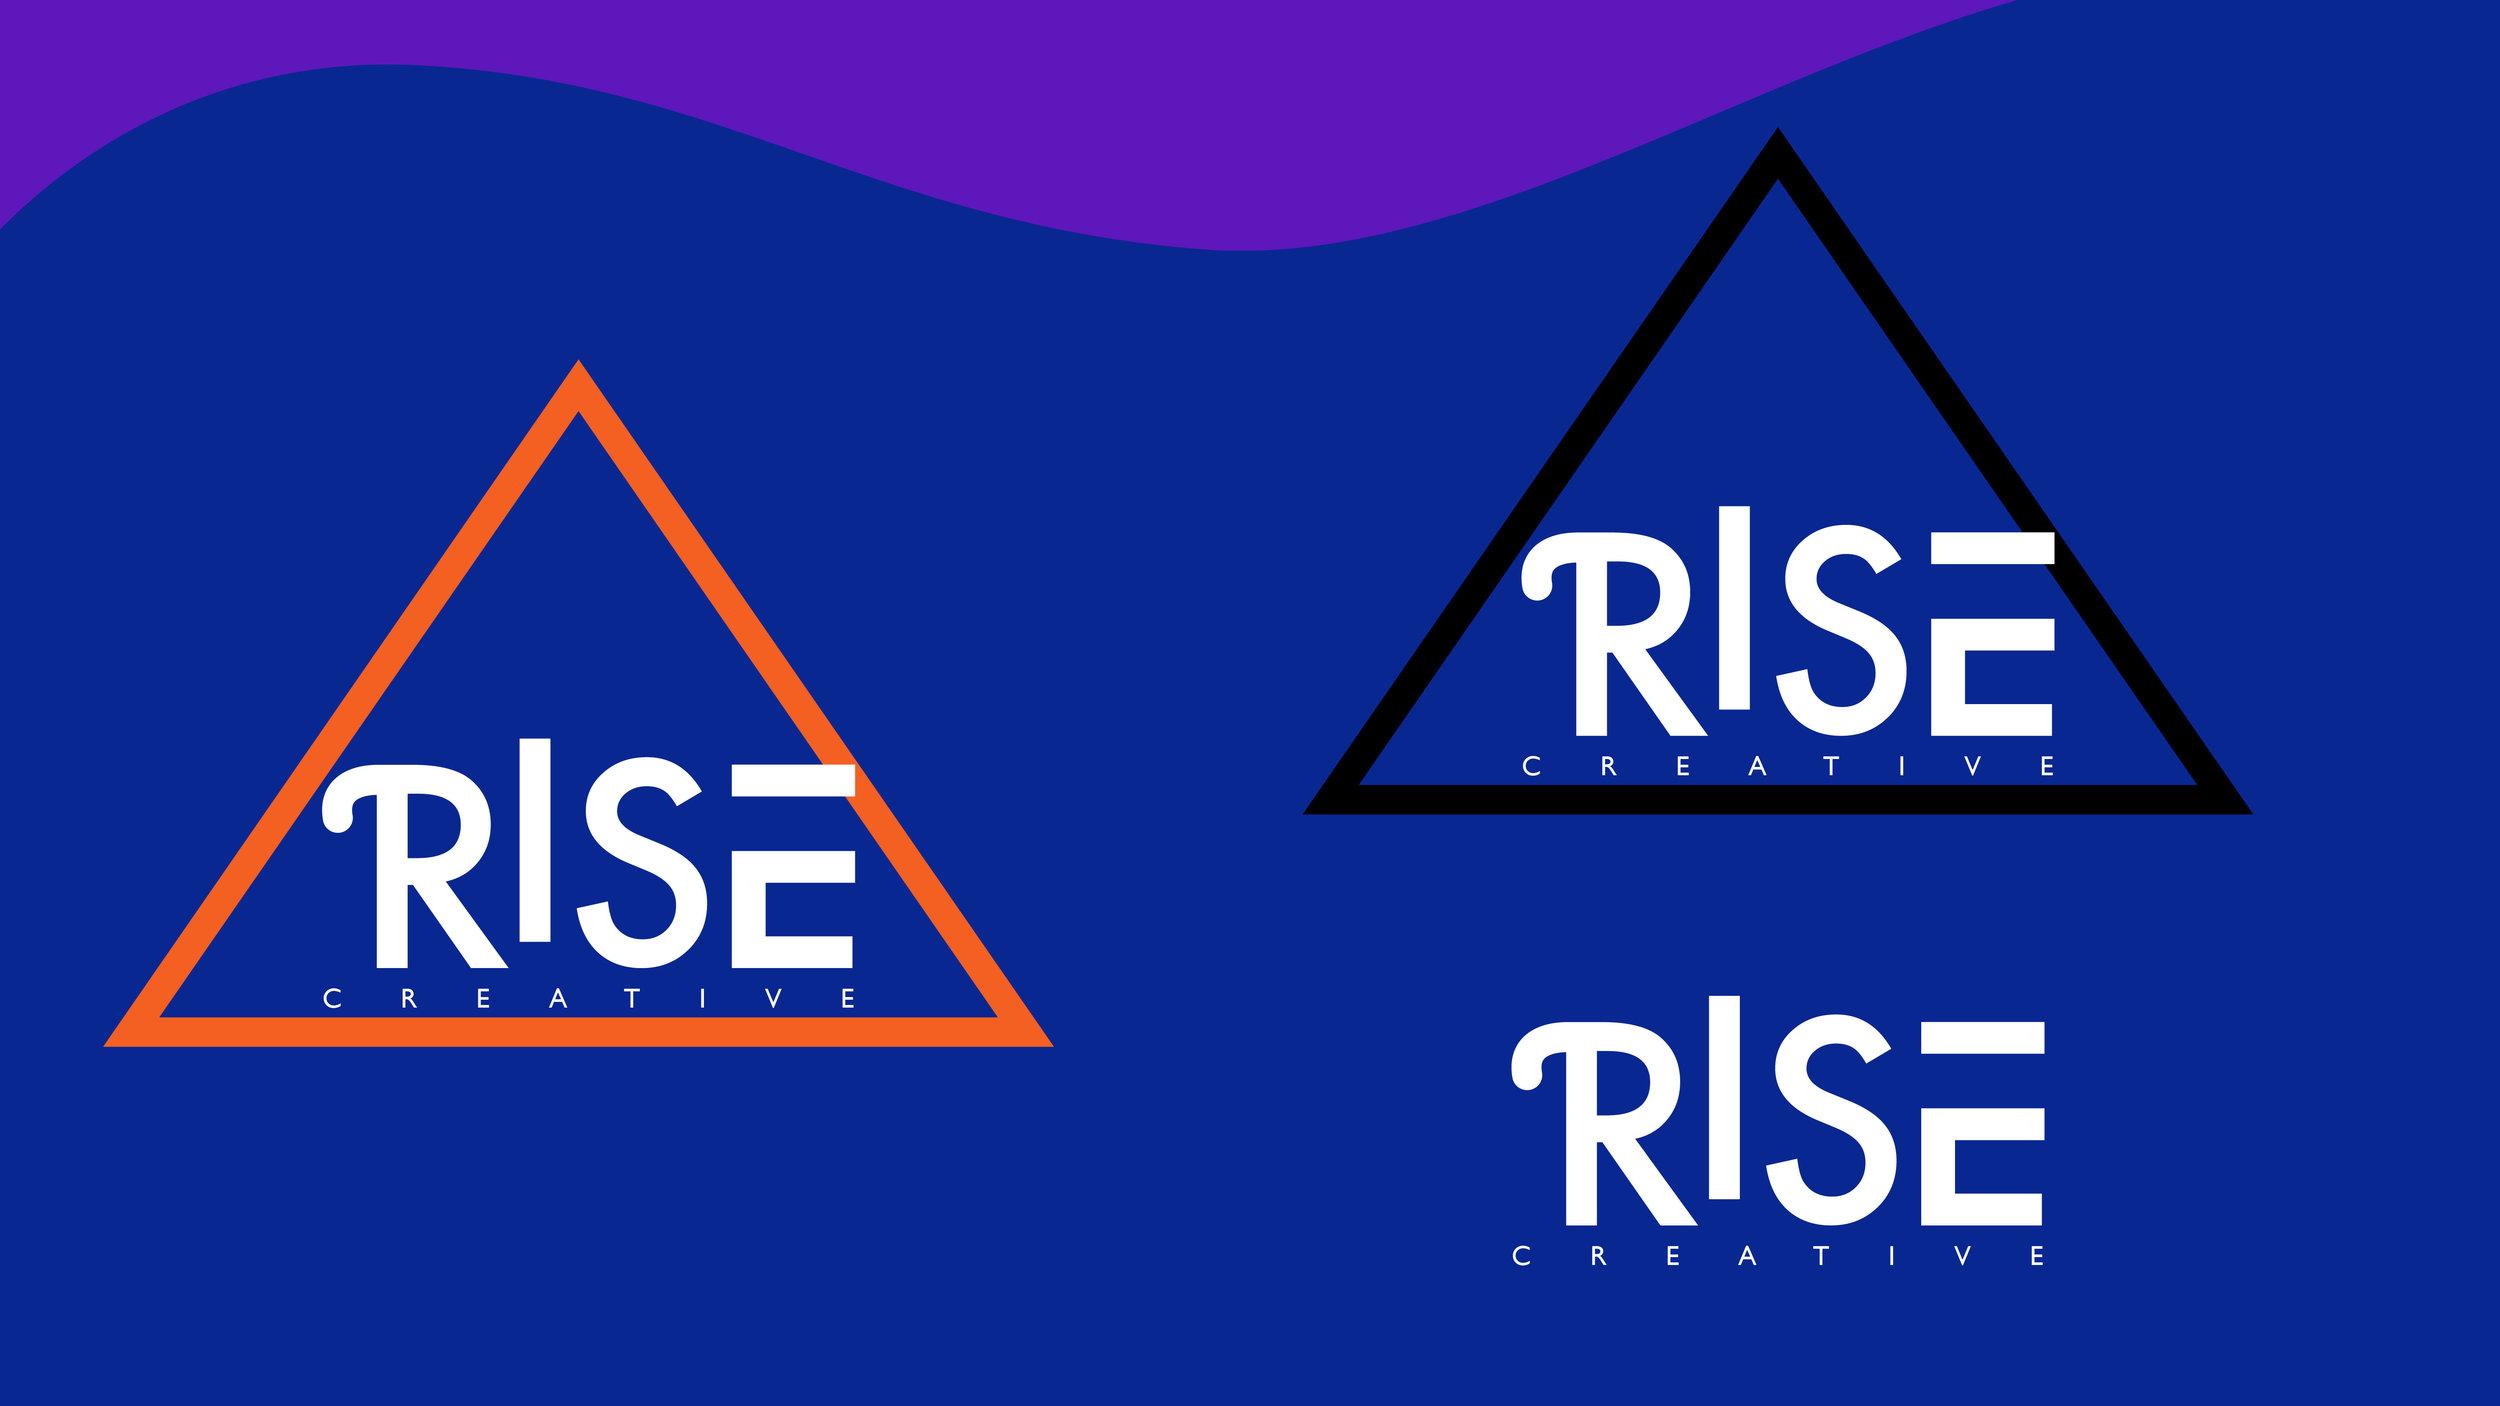 Rise Creative Brand